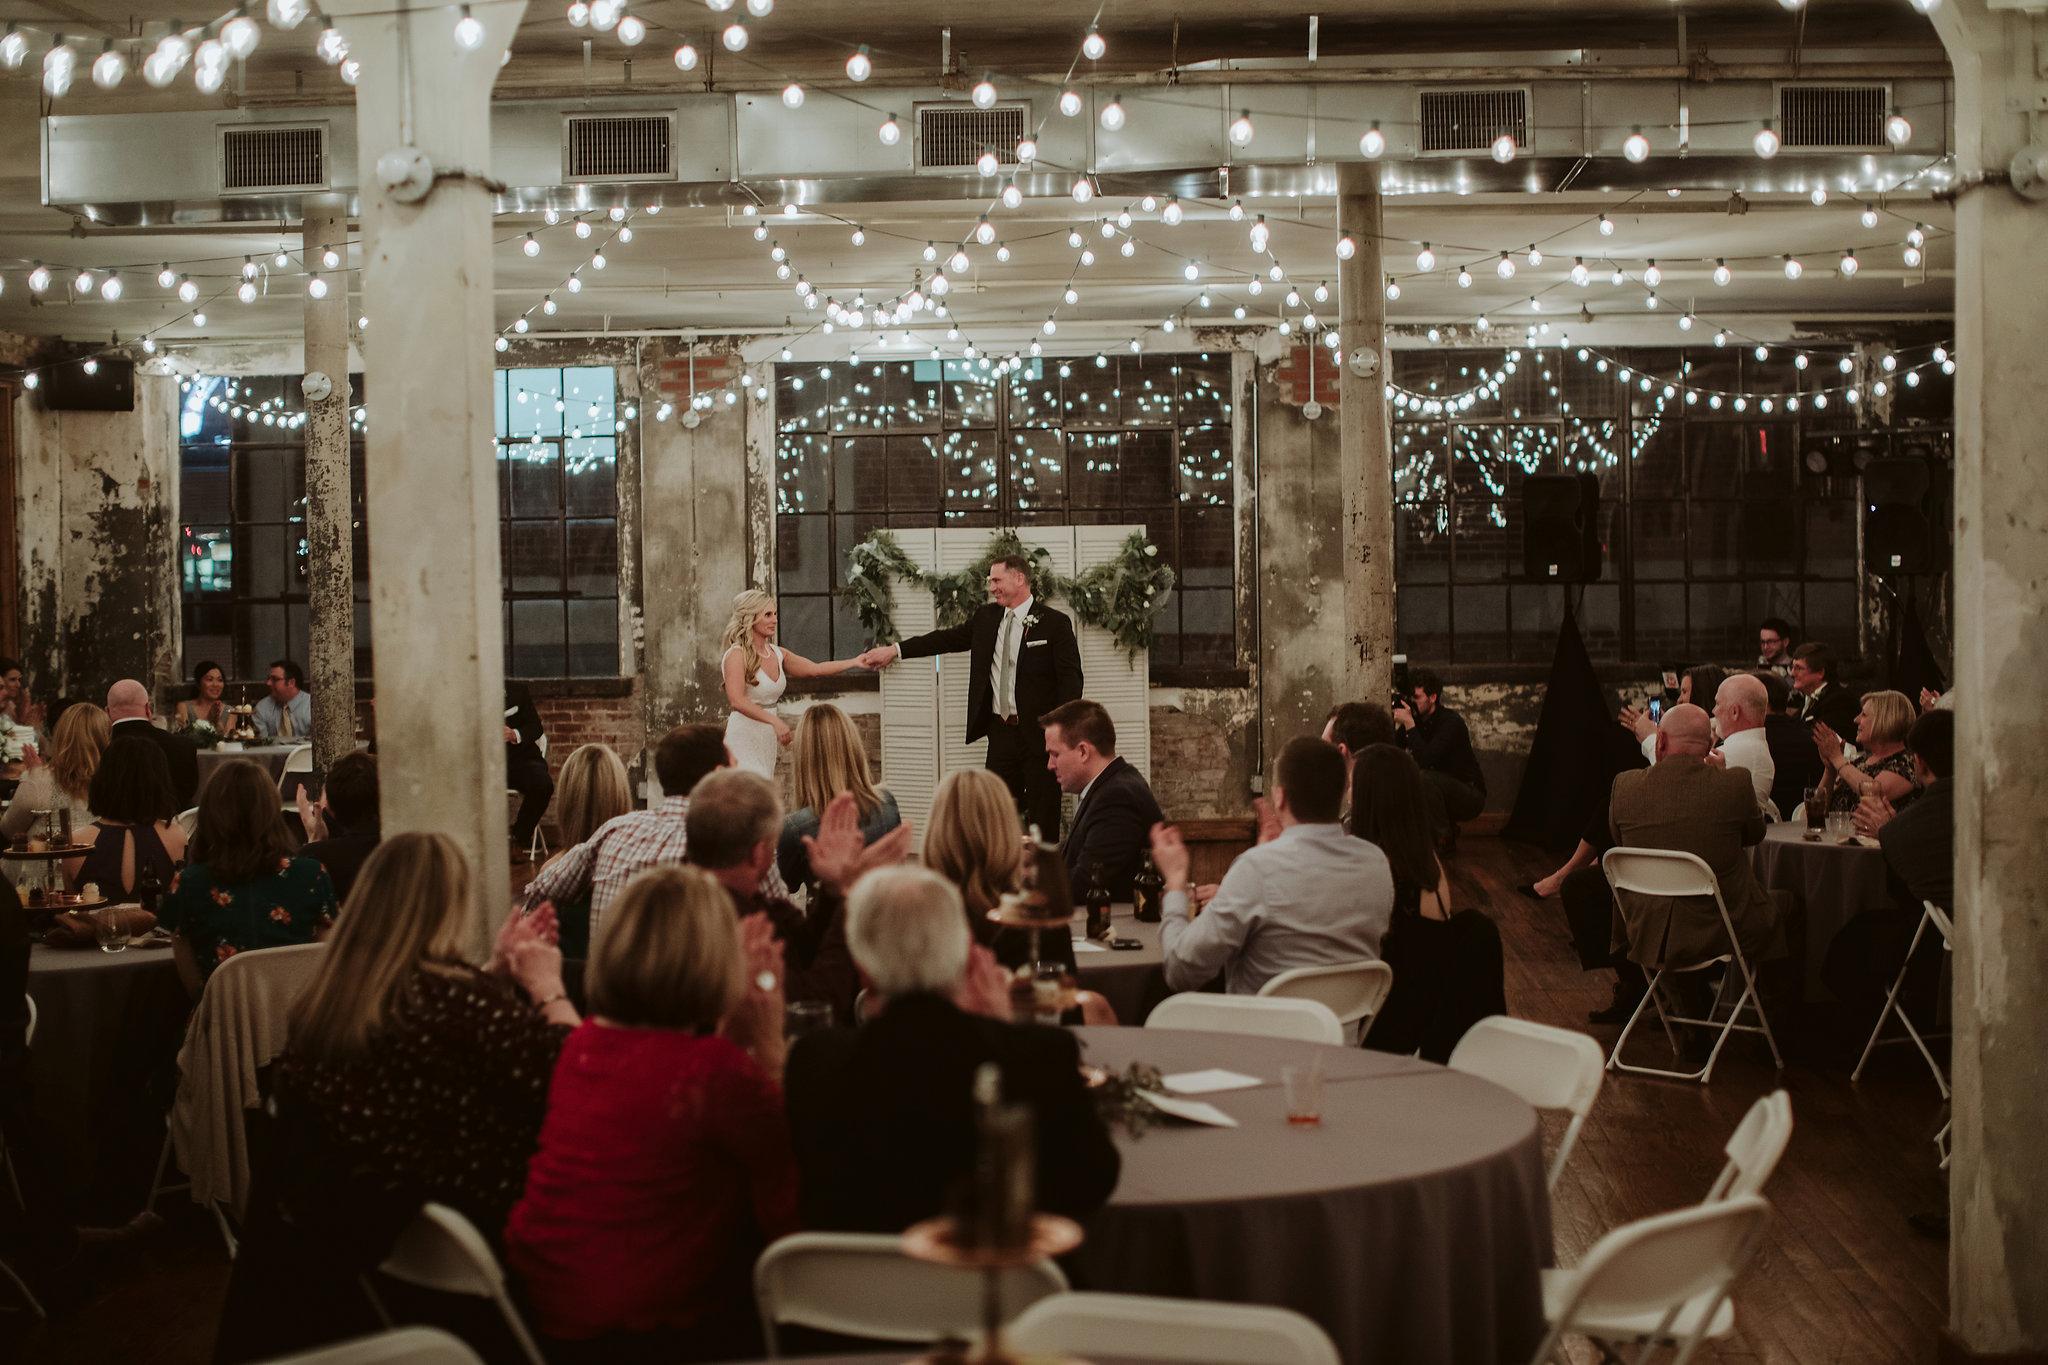 The Bride and The Bauer Wedding_Cinder Block Brewery Wedding_Kindling Wedding Photography_13.JPG